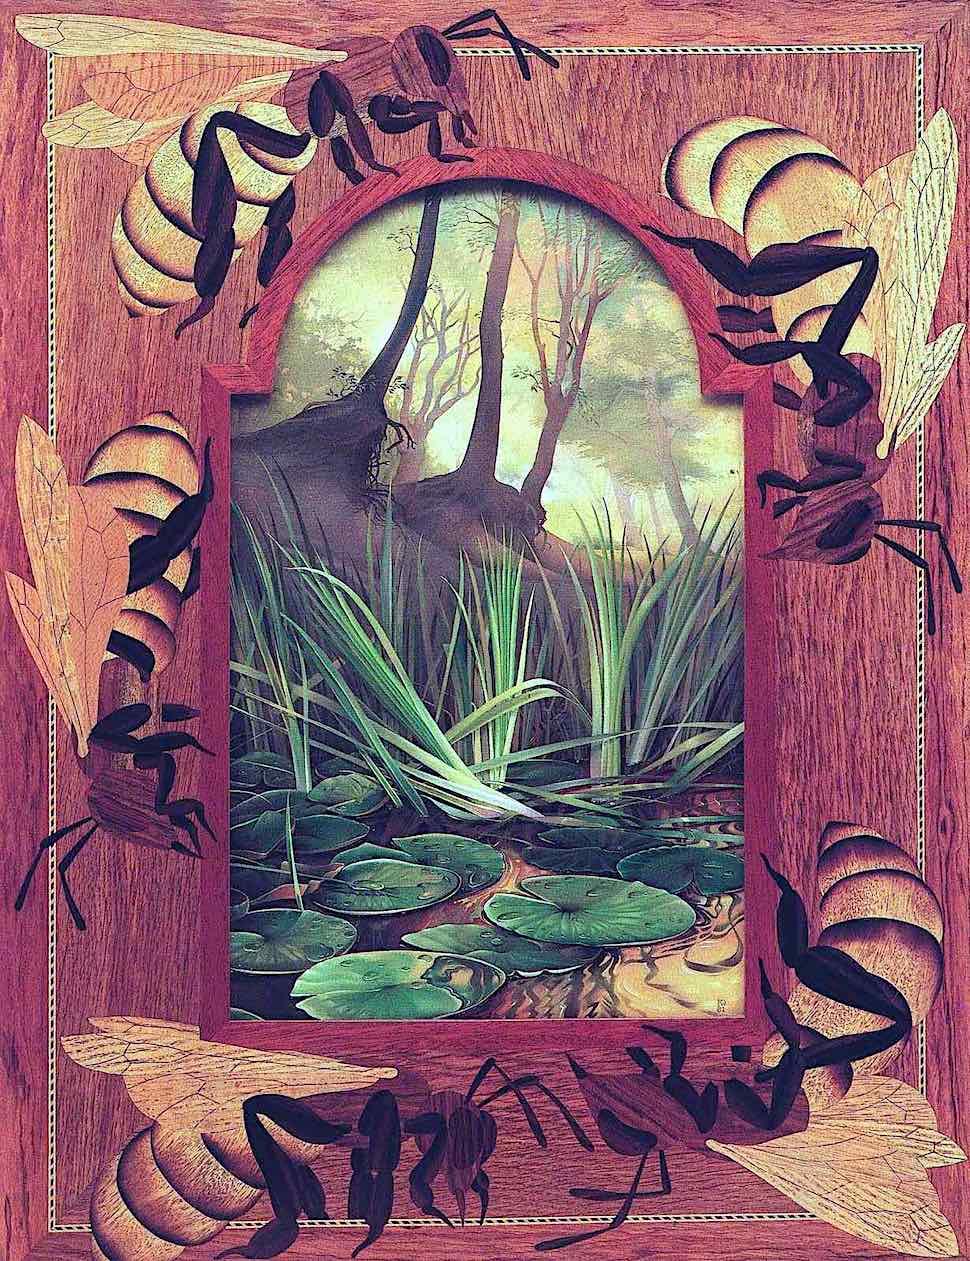 Kit Williams art, a wood bees frame, marsh reeds